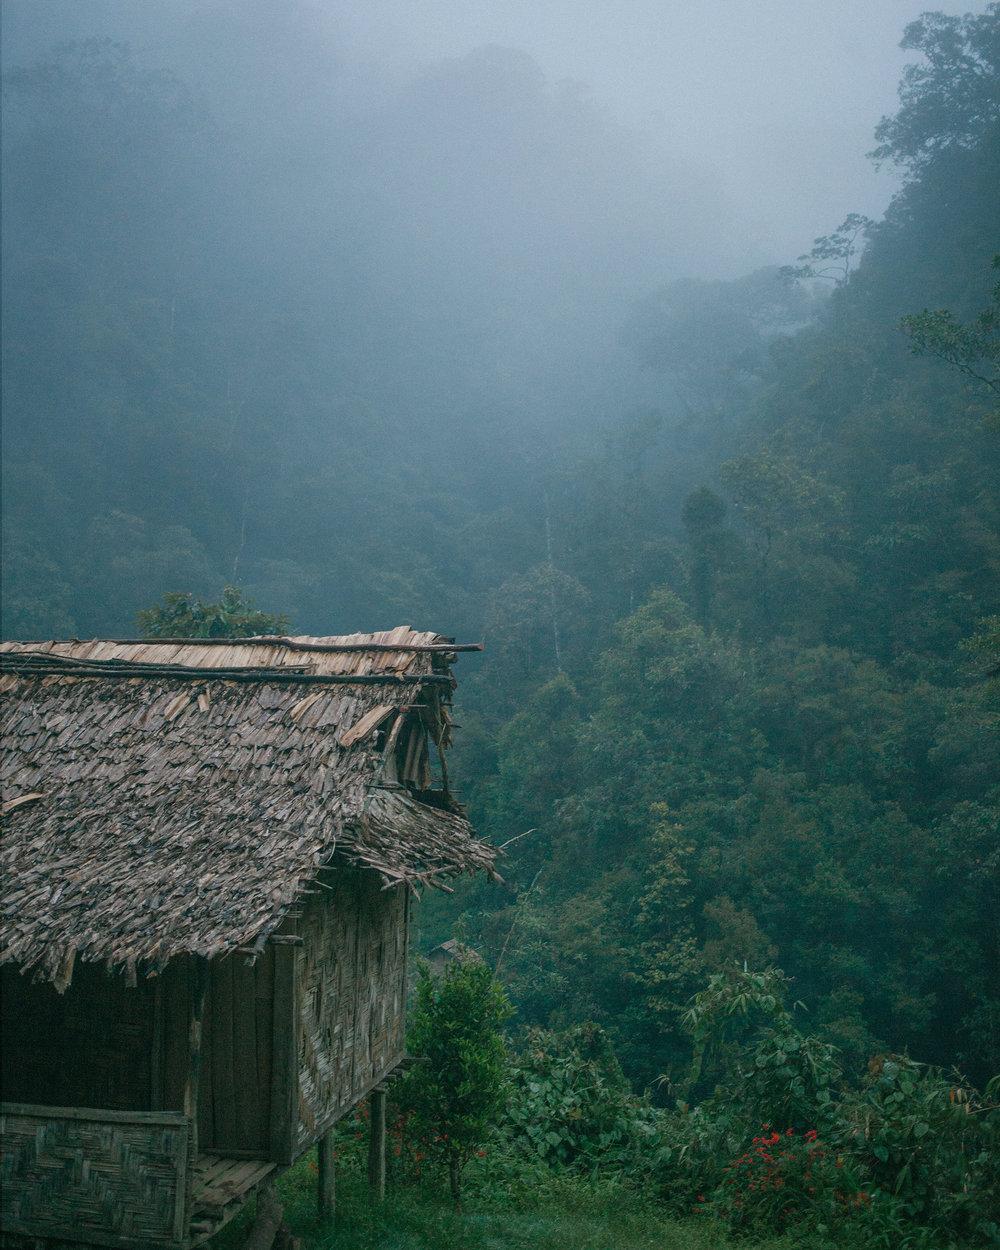 Walking the kokoda track - Papua New Guinea